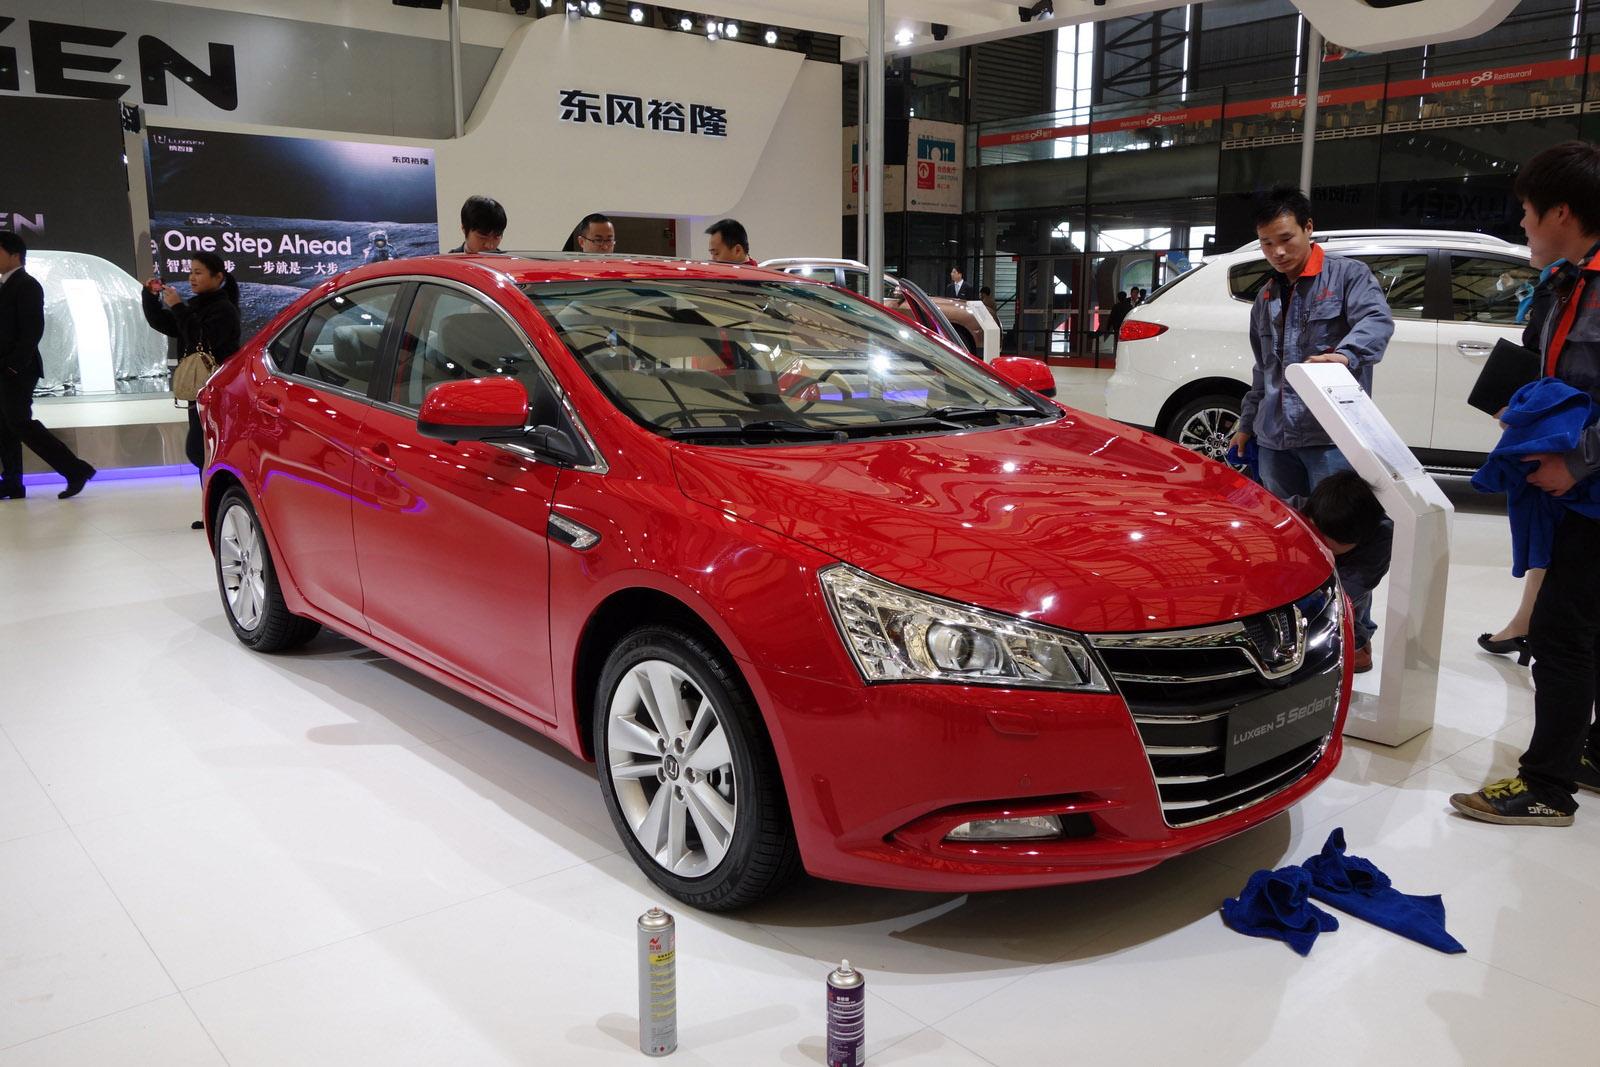 Luxgen 5 Sedan Shanghai 2013 - Picture 84577